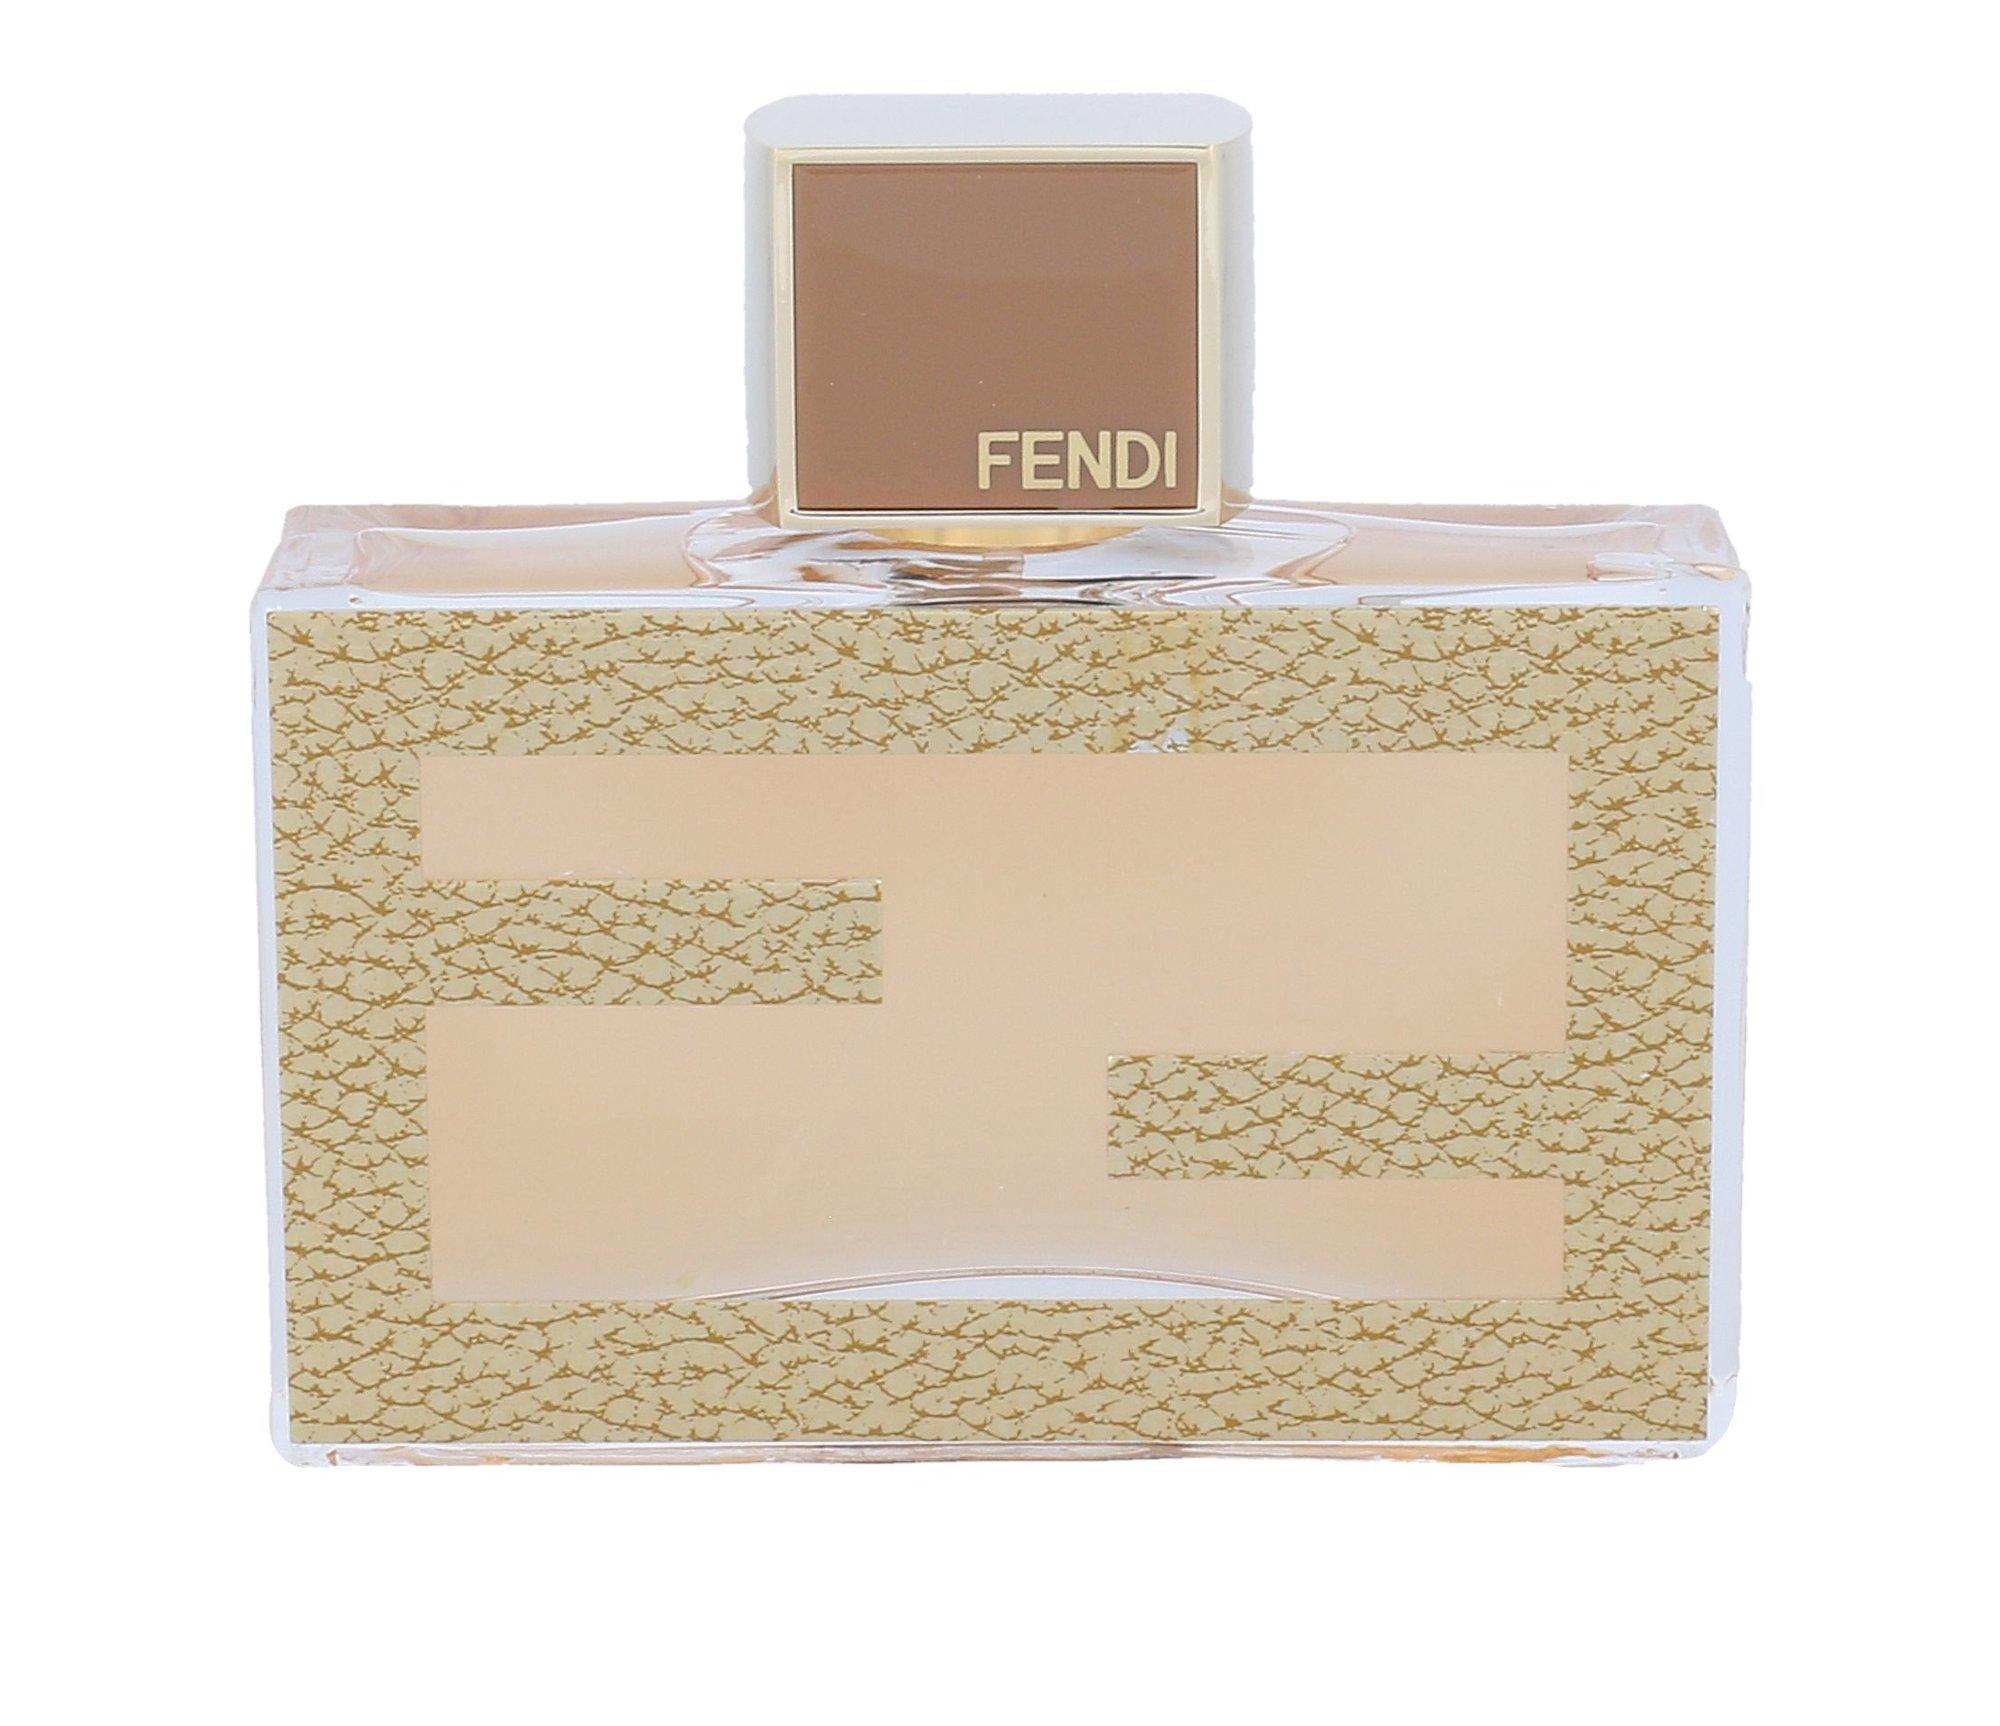 Fendi Fan di Fendi Leather Essence EDP 75ml